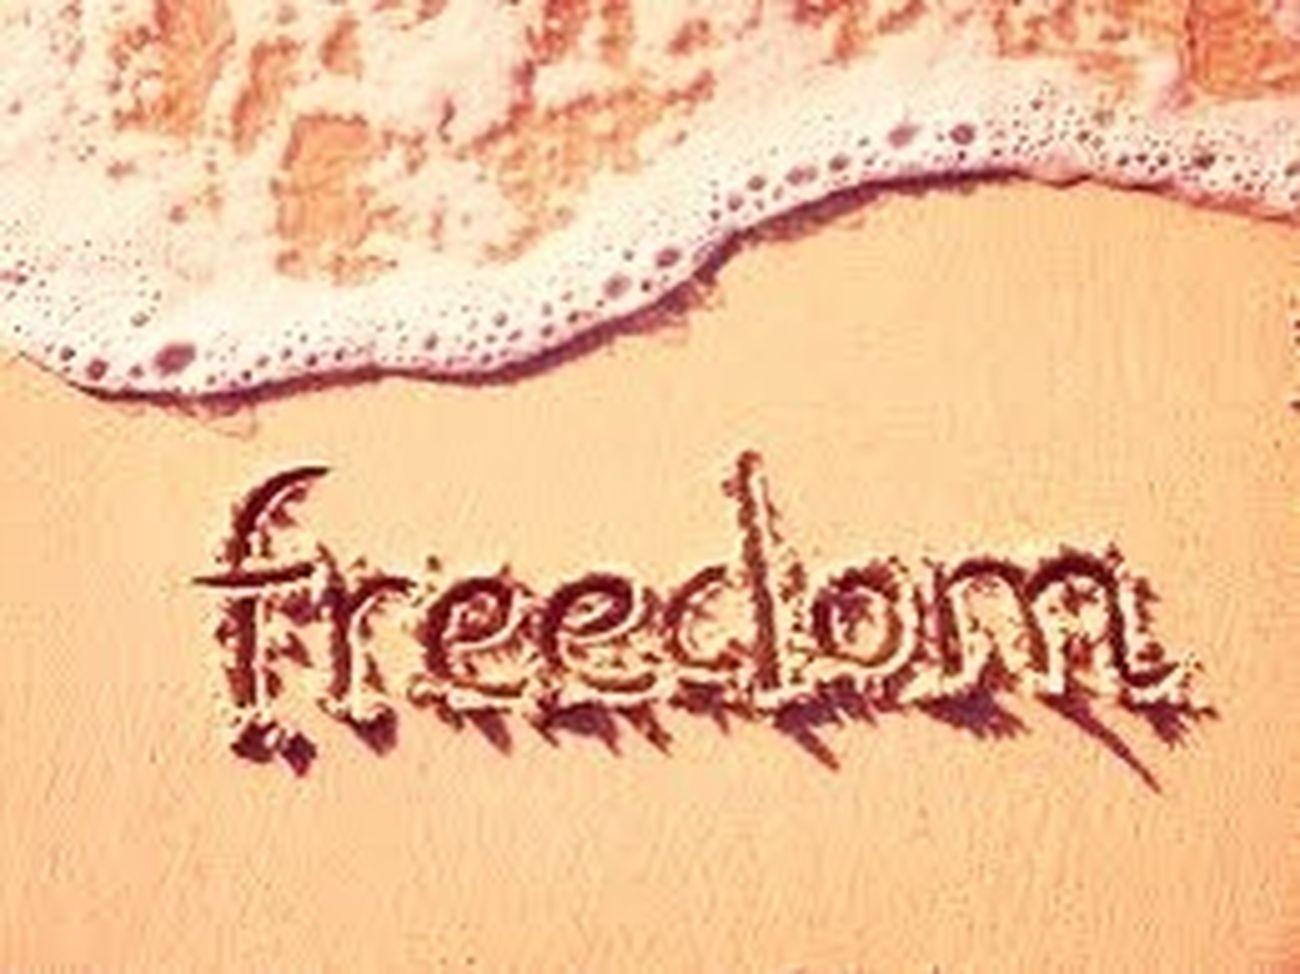 Freedom (: